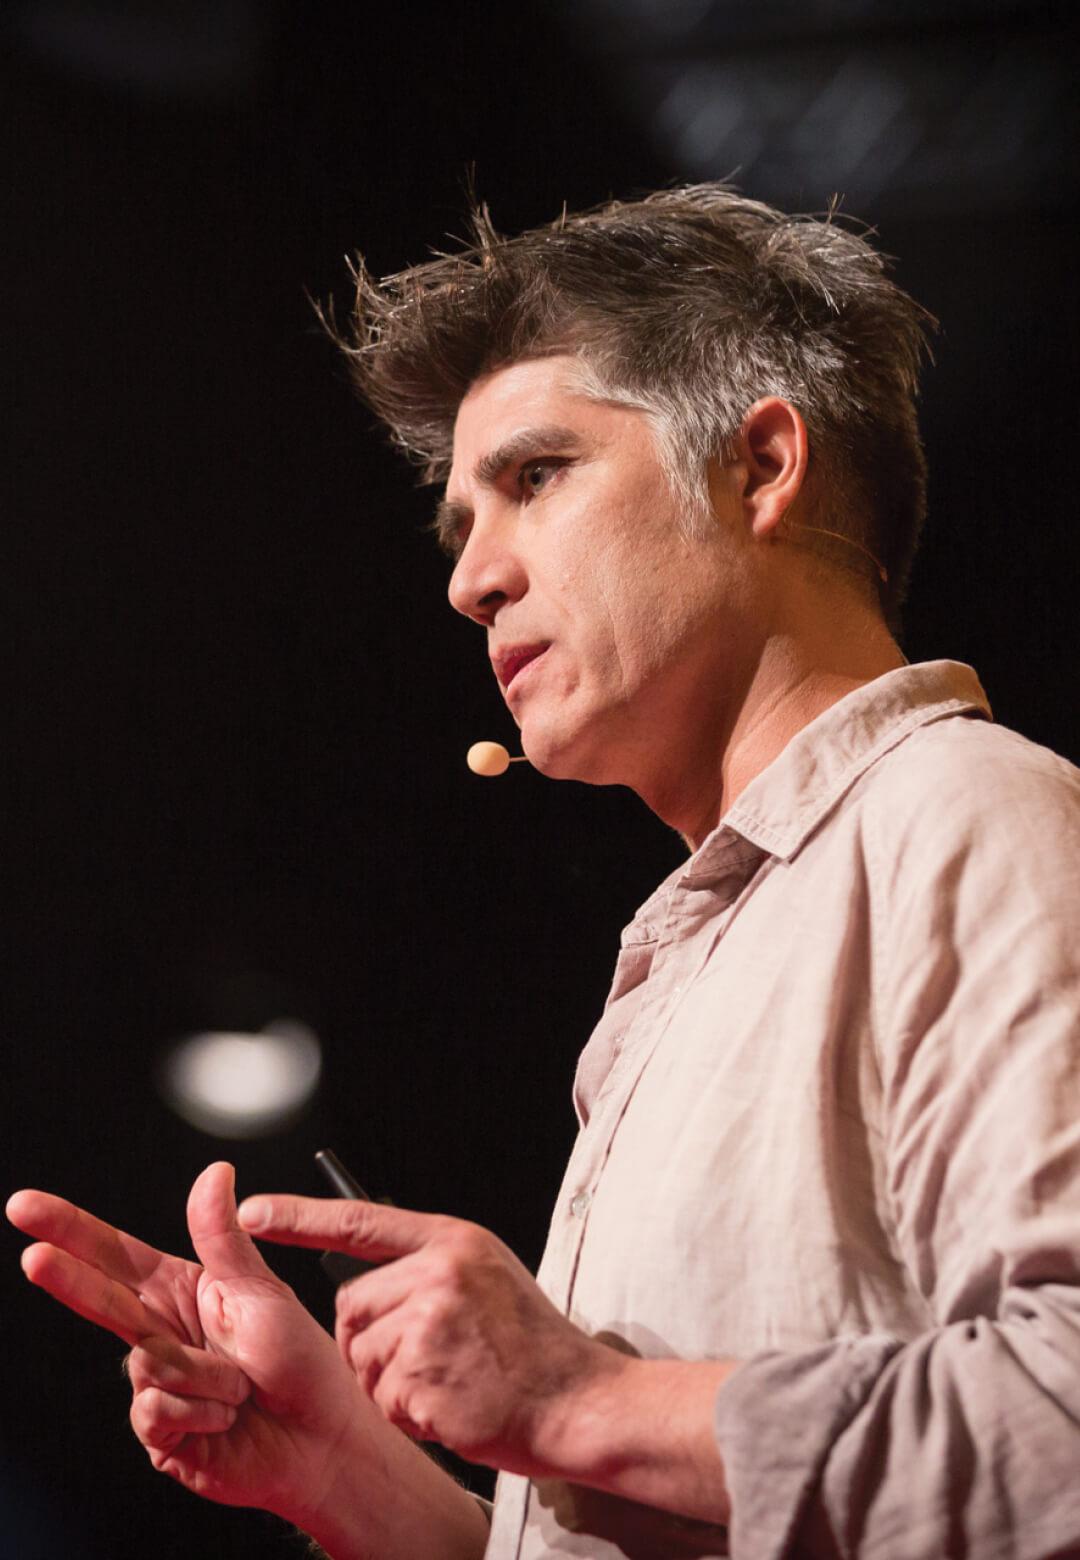 Pritzker Prize laureate Alejandro Aravena giving a presentation | Alejandro Aravena | Pritzker Architecture Prize | STIRworld